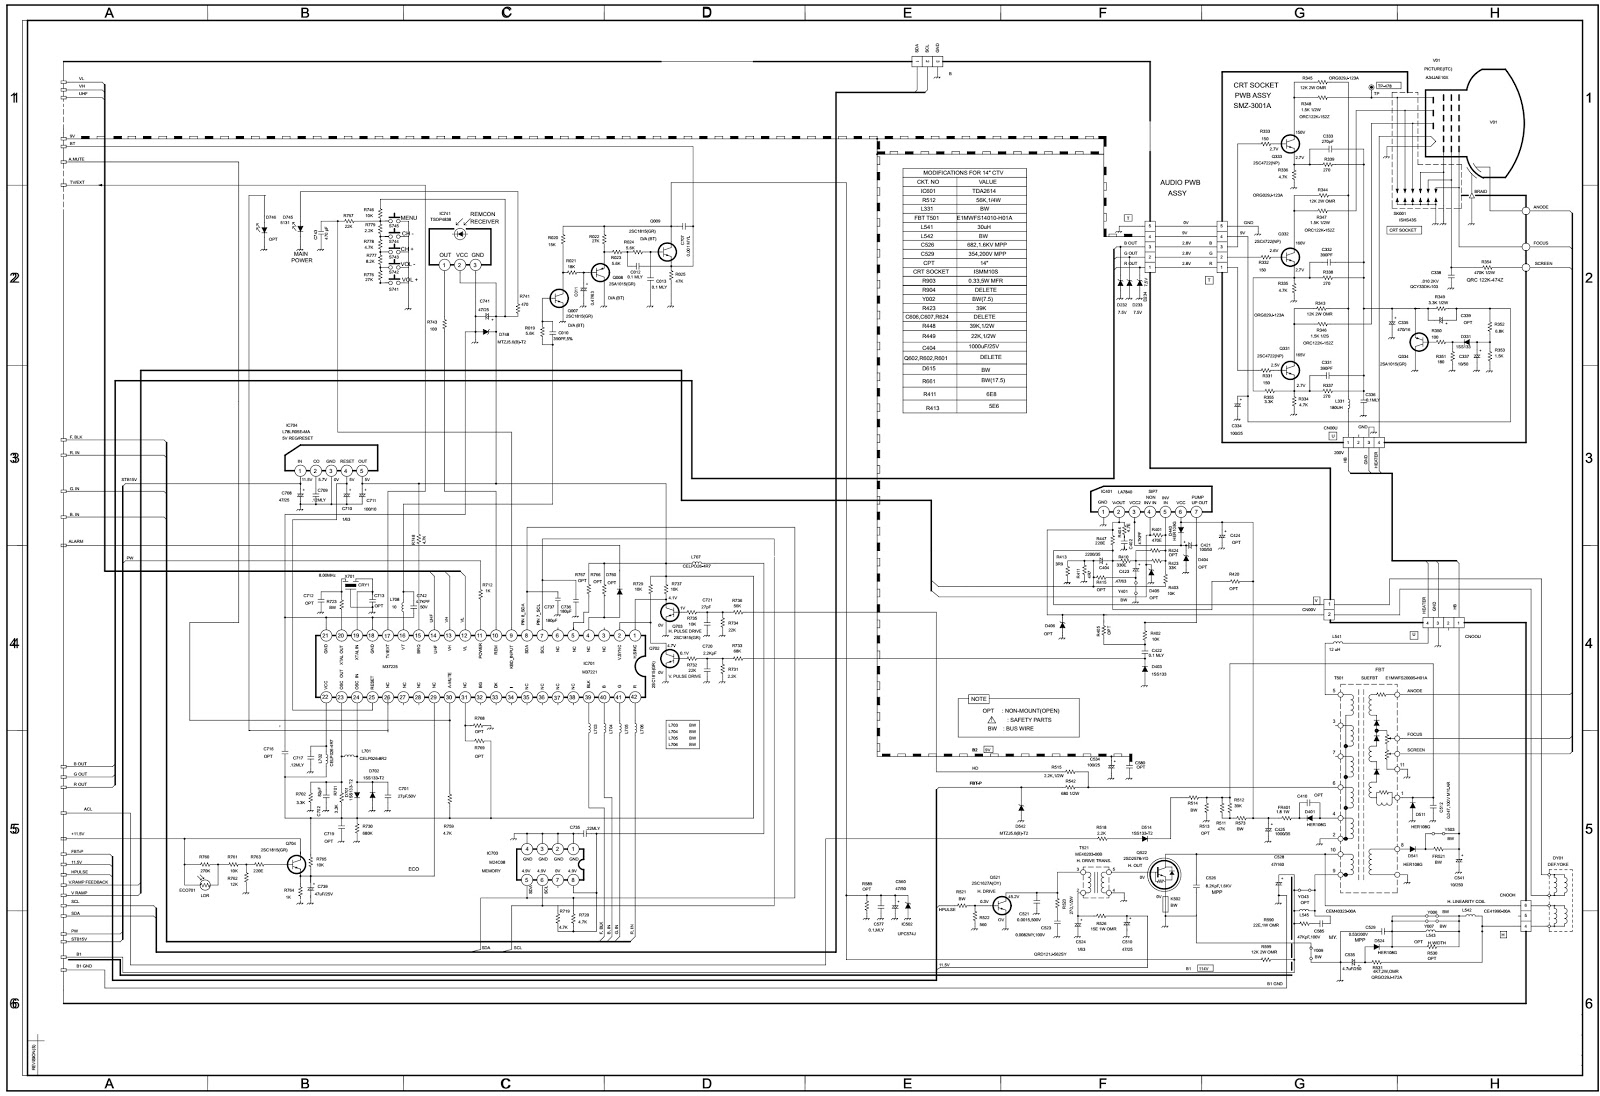 b w zeppelin circuit diagram wiring diagram datasource b w zeppelin circuit diagram [ 1600 x 1096 Pixel ]